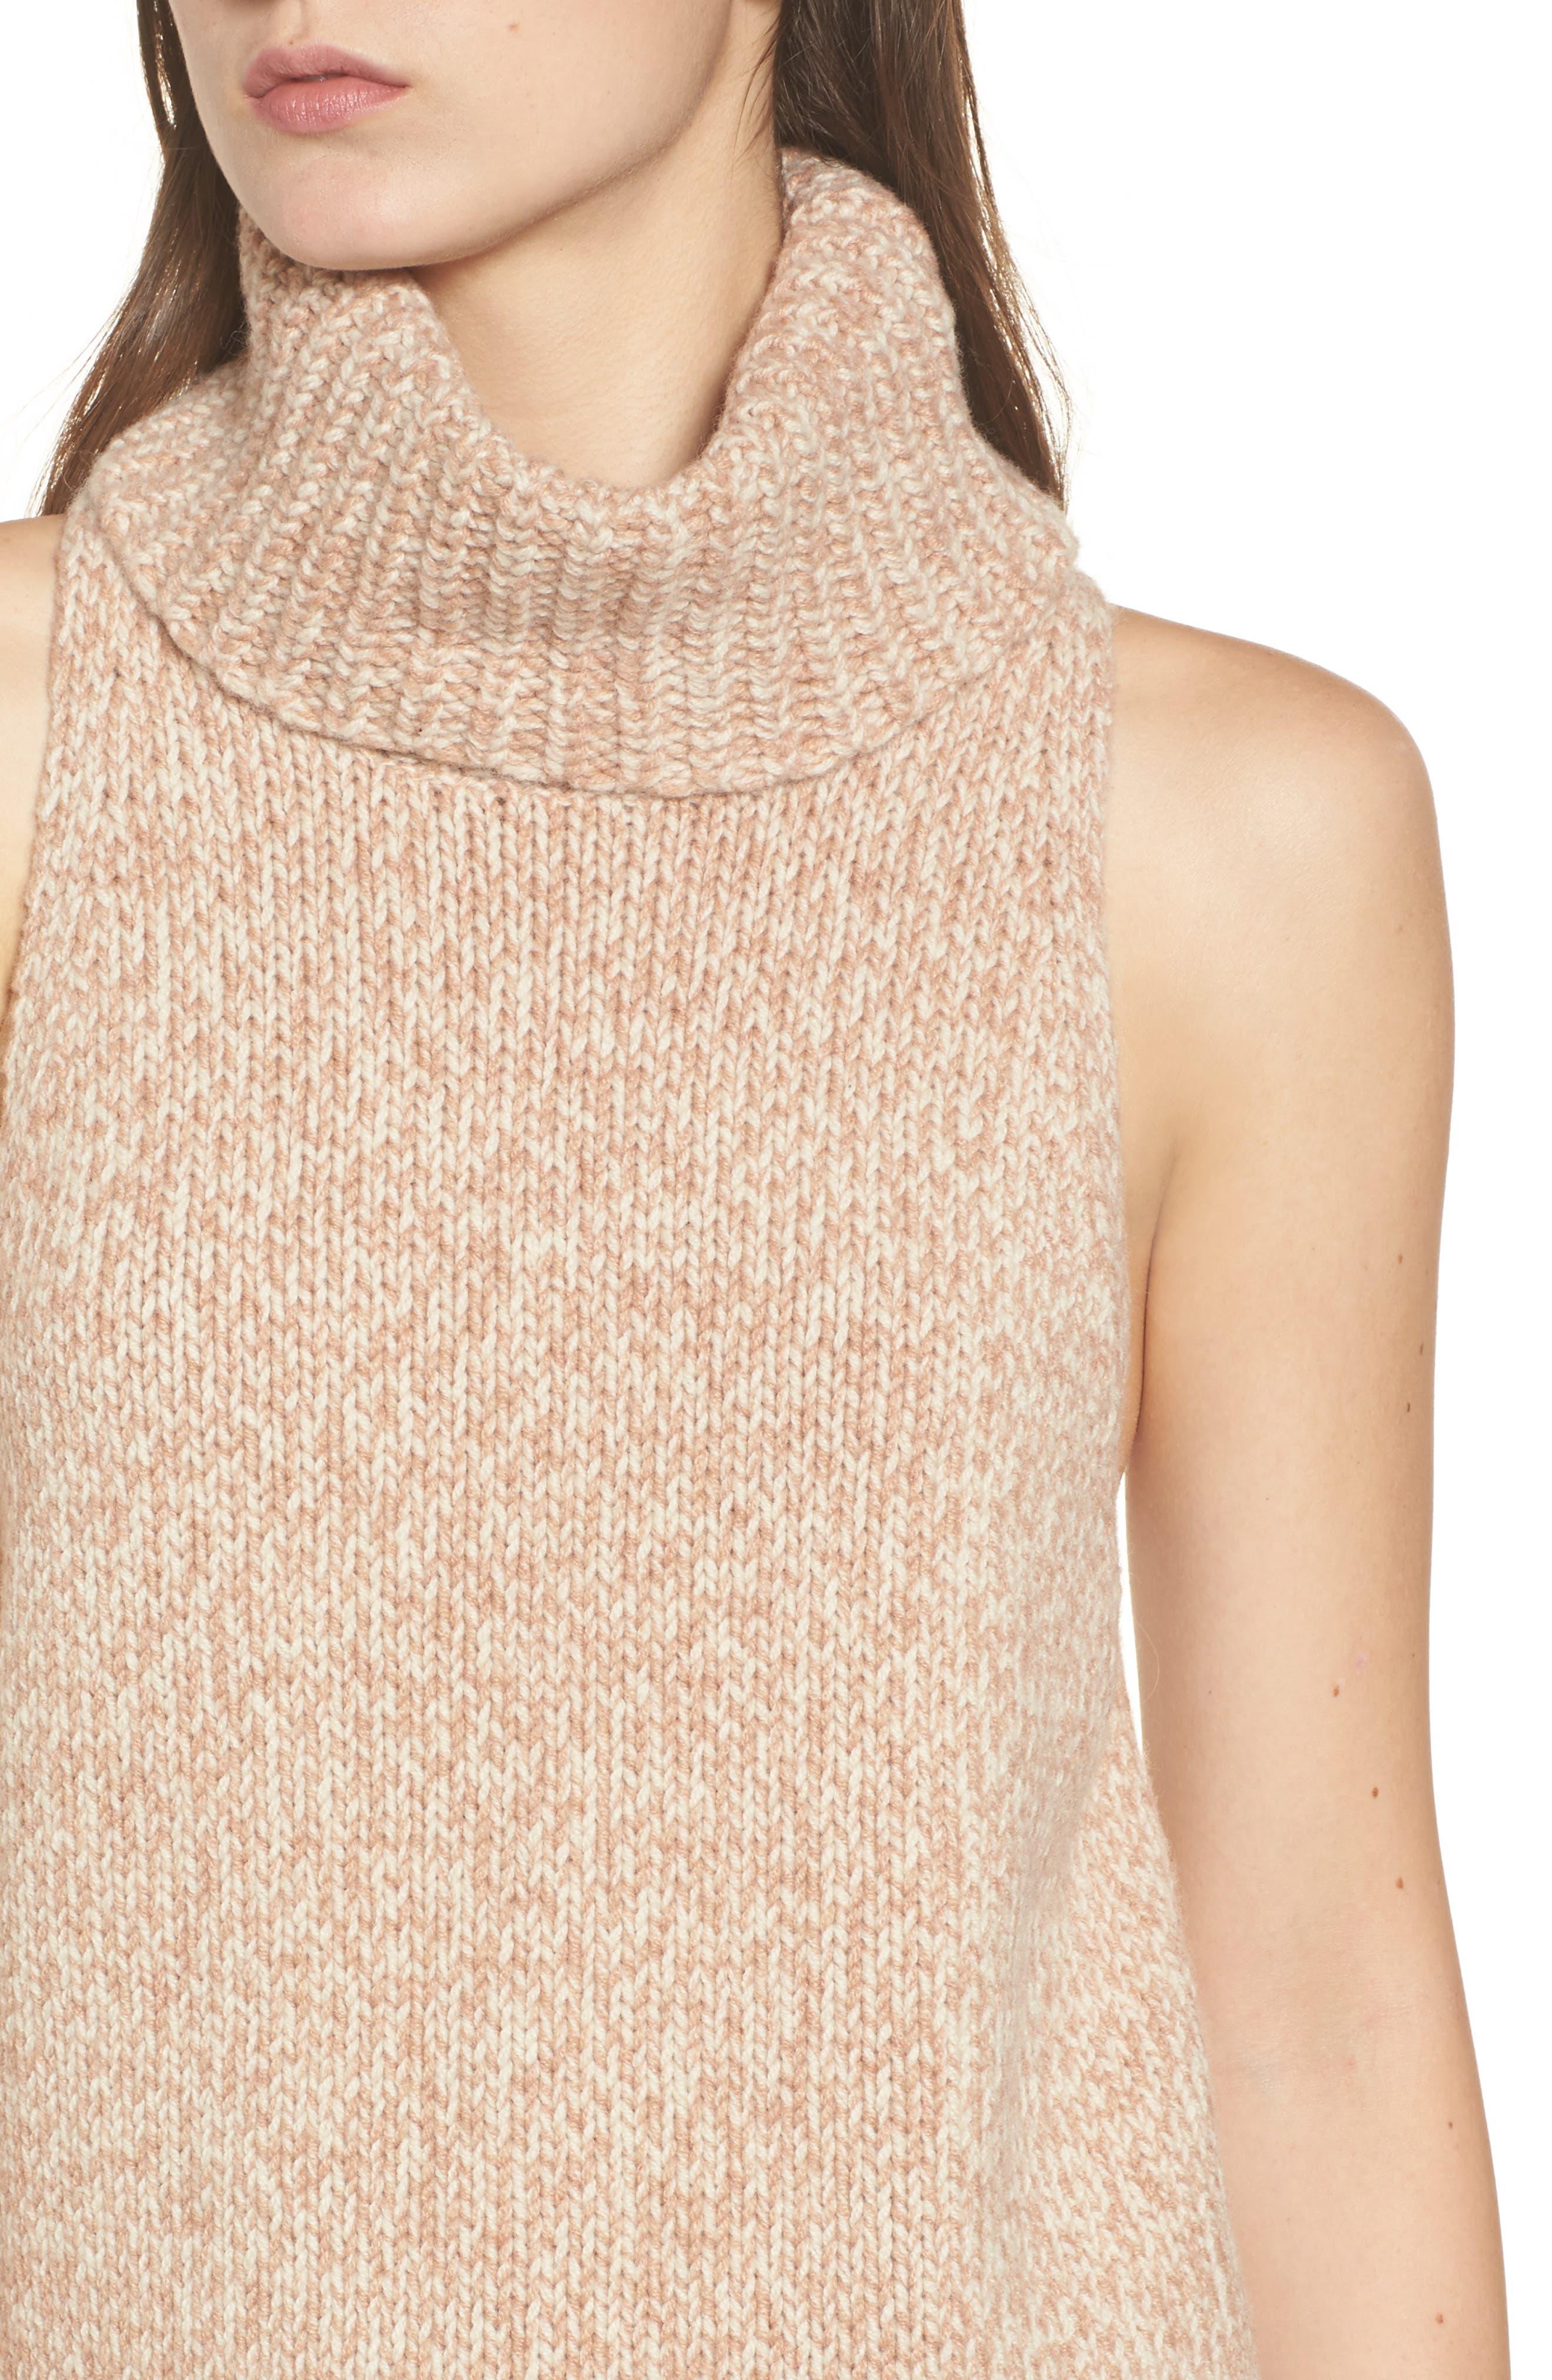 Marled Sleeveless Turtleneck Sweater,                             Alternate thumbnail 4, color,                             Marled Voile